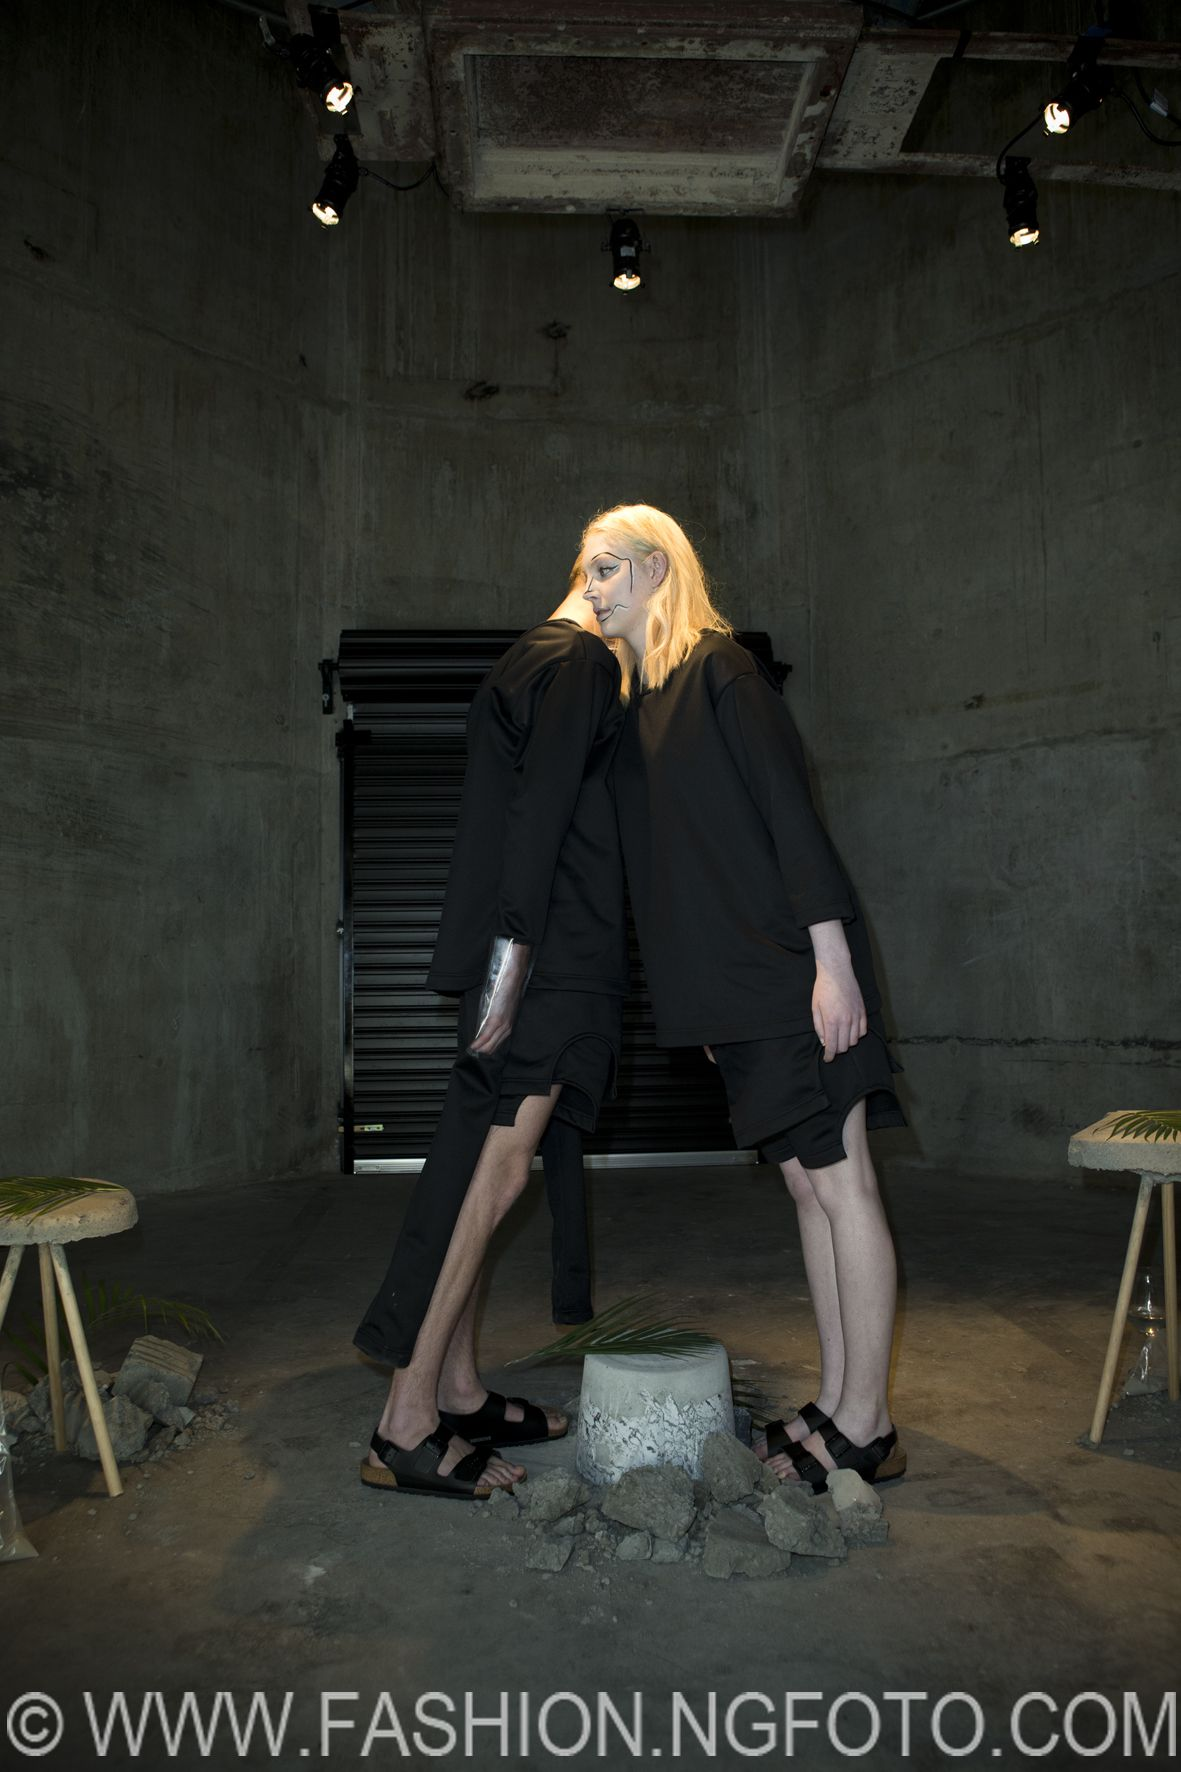 New Zealand Fashion Week INSIDER: Thprks. Photo credit: Michael Ng (NG FOTO)  #nzfw #thprks #invertededge #fashion #nz